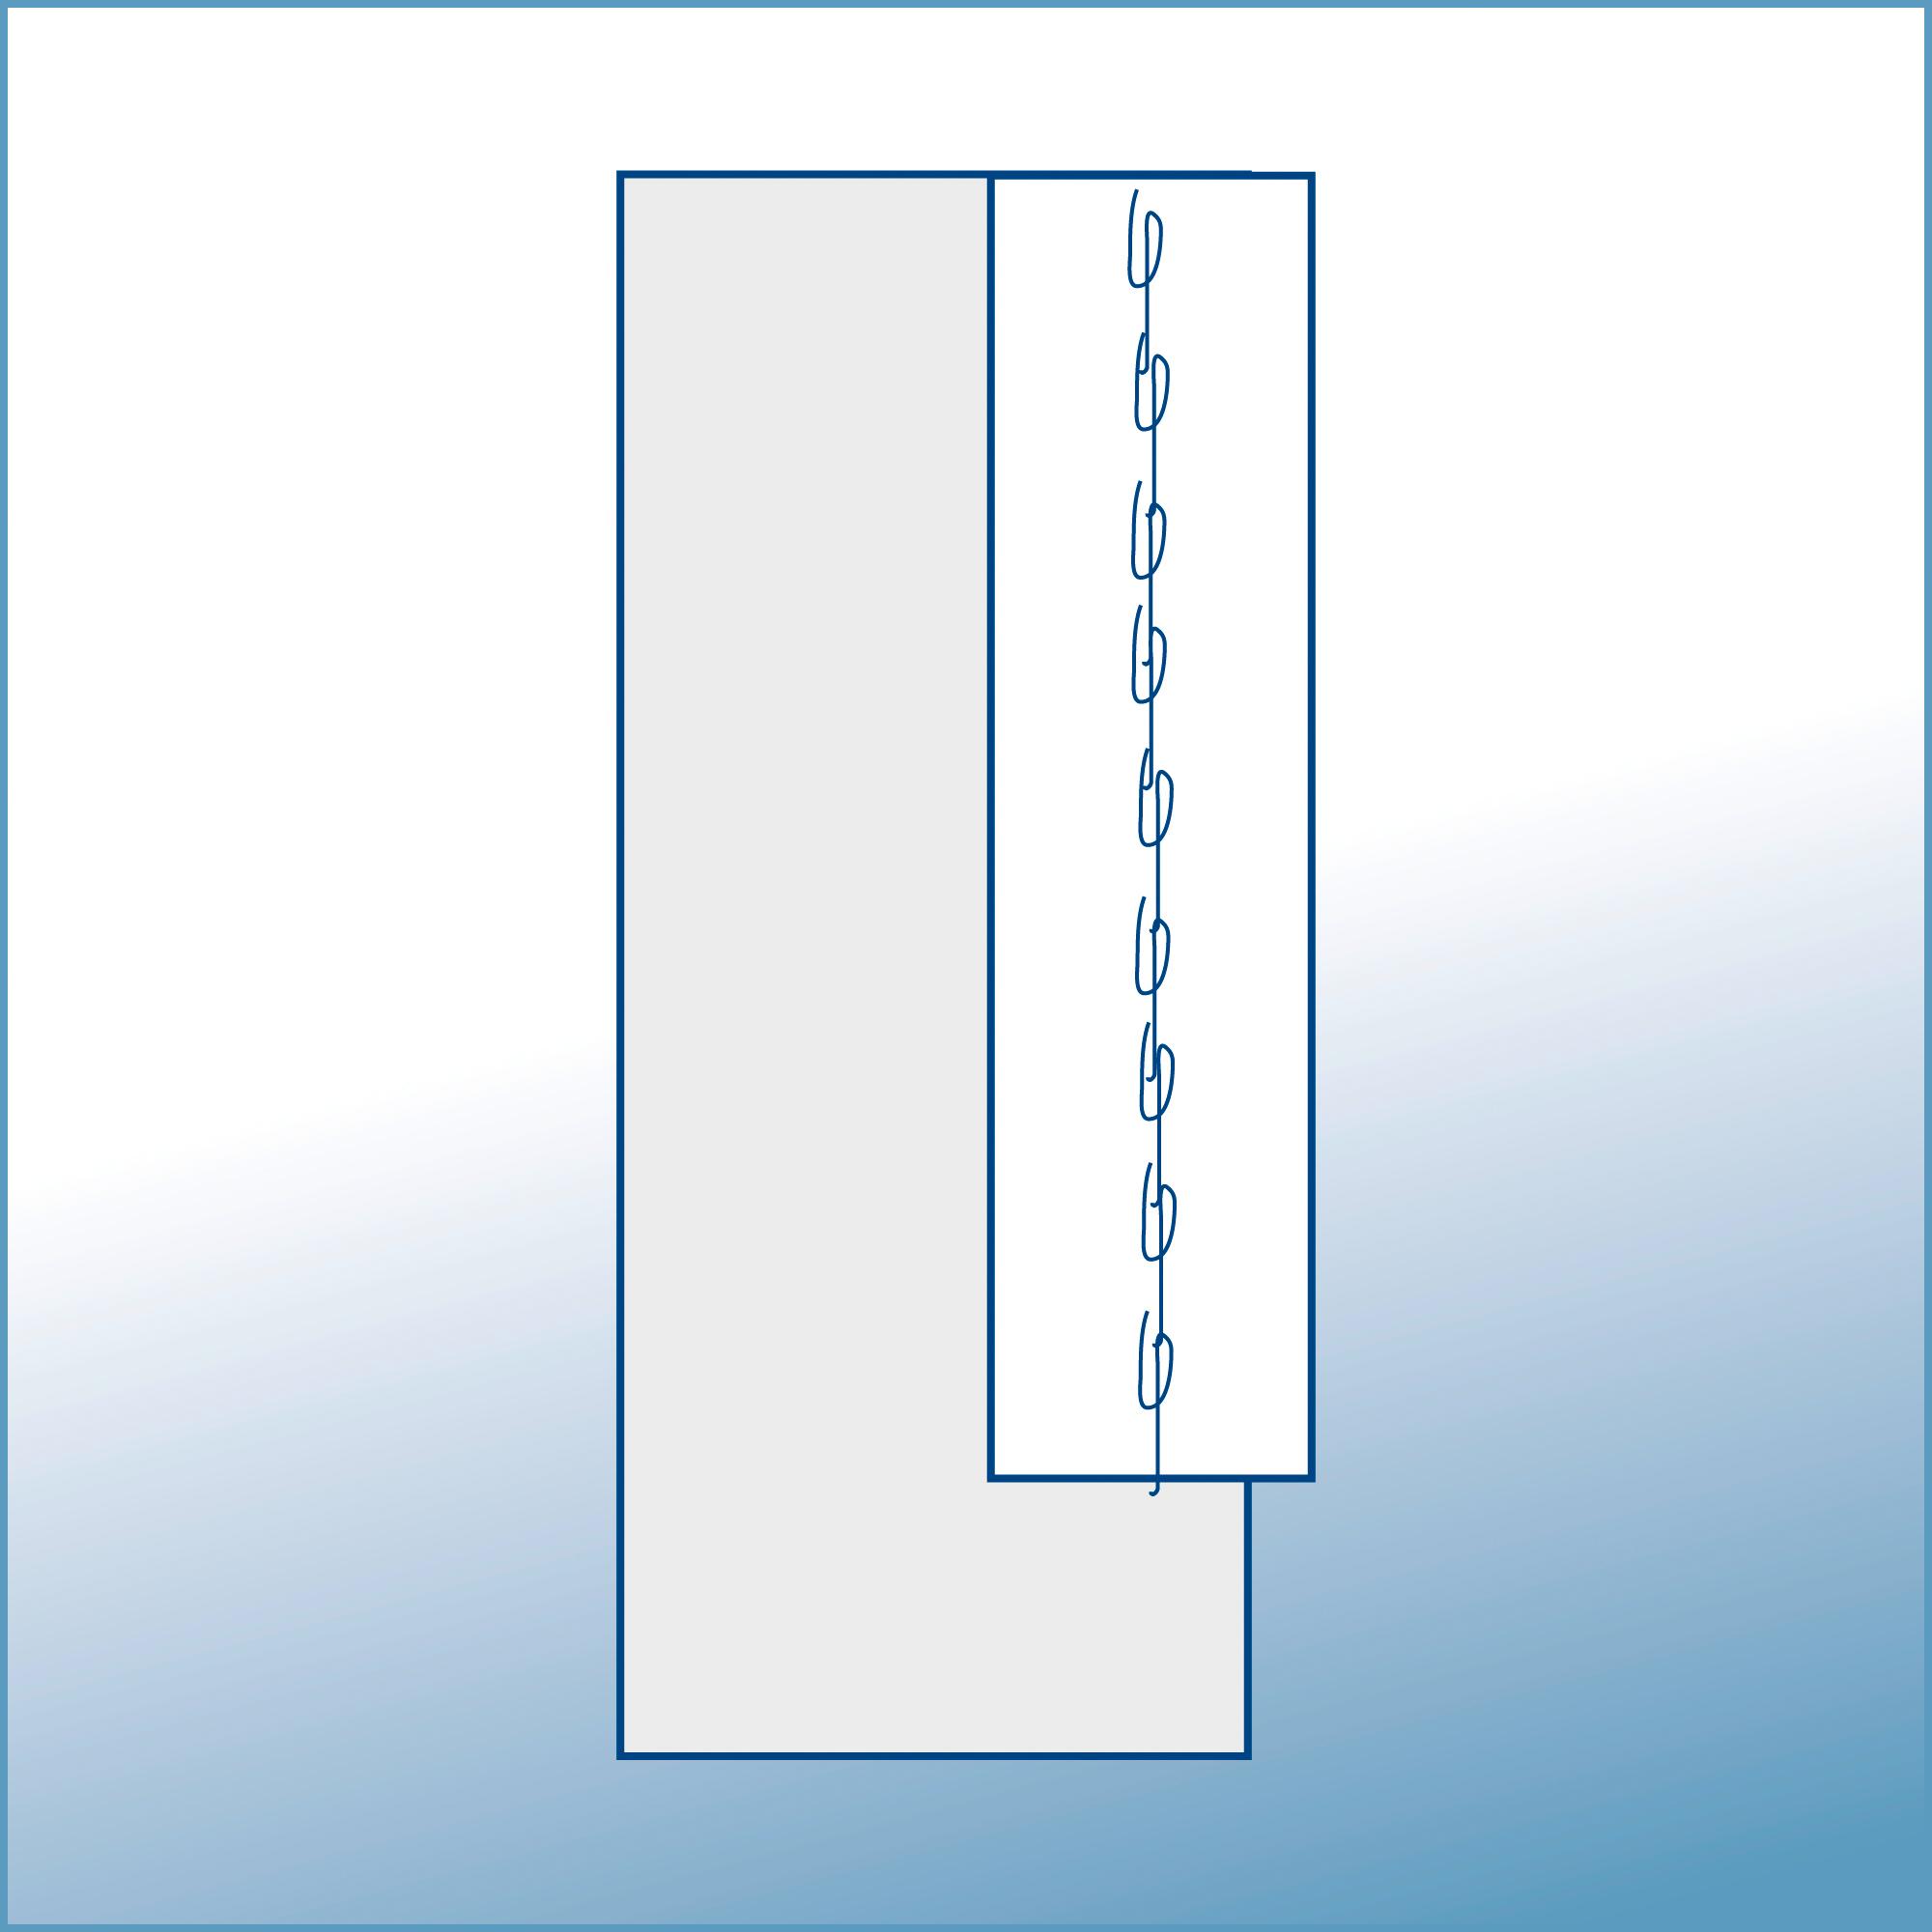 CE 6025 | SEWN TAPE | Steel grey | 75 mm